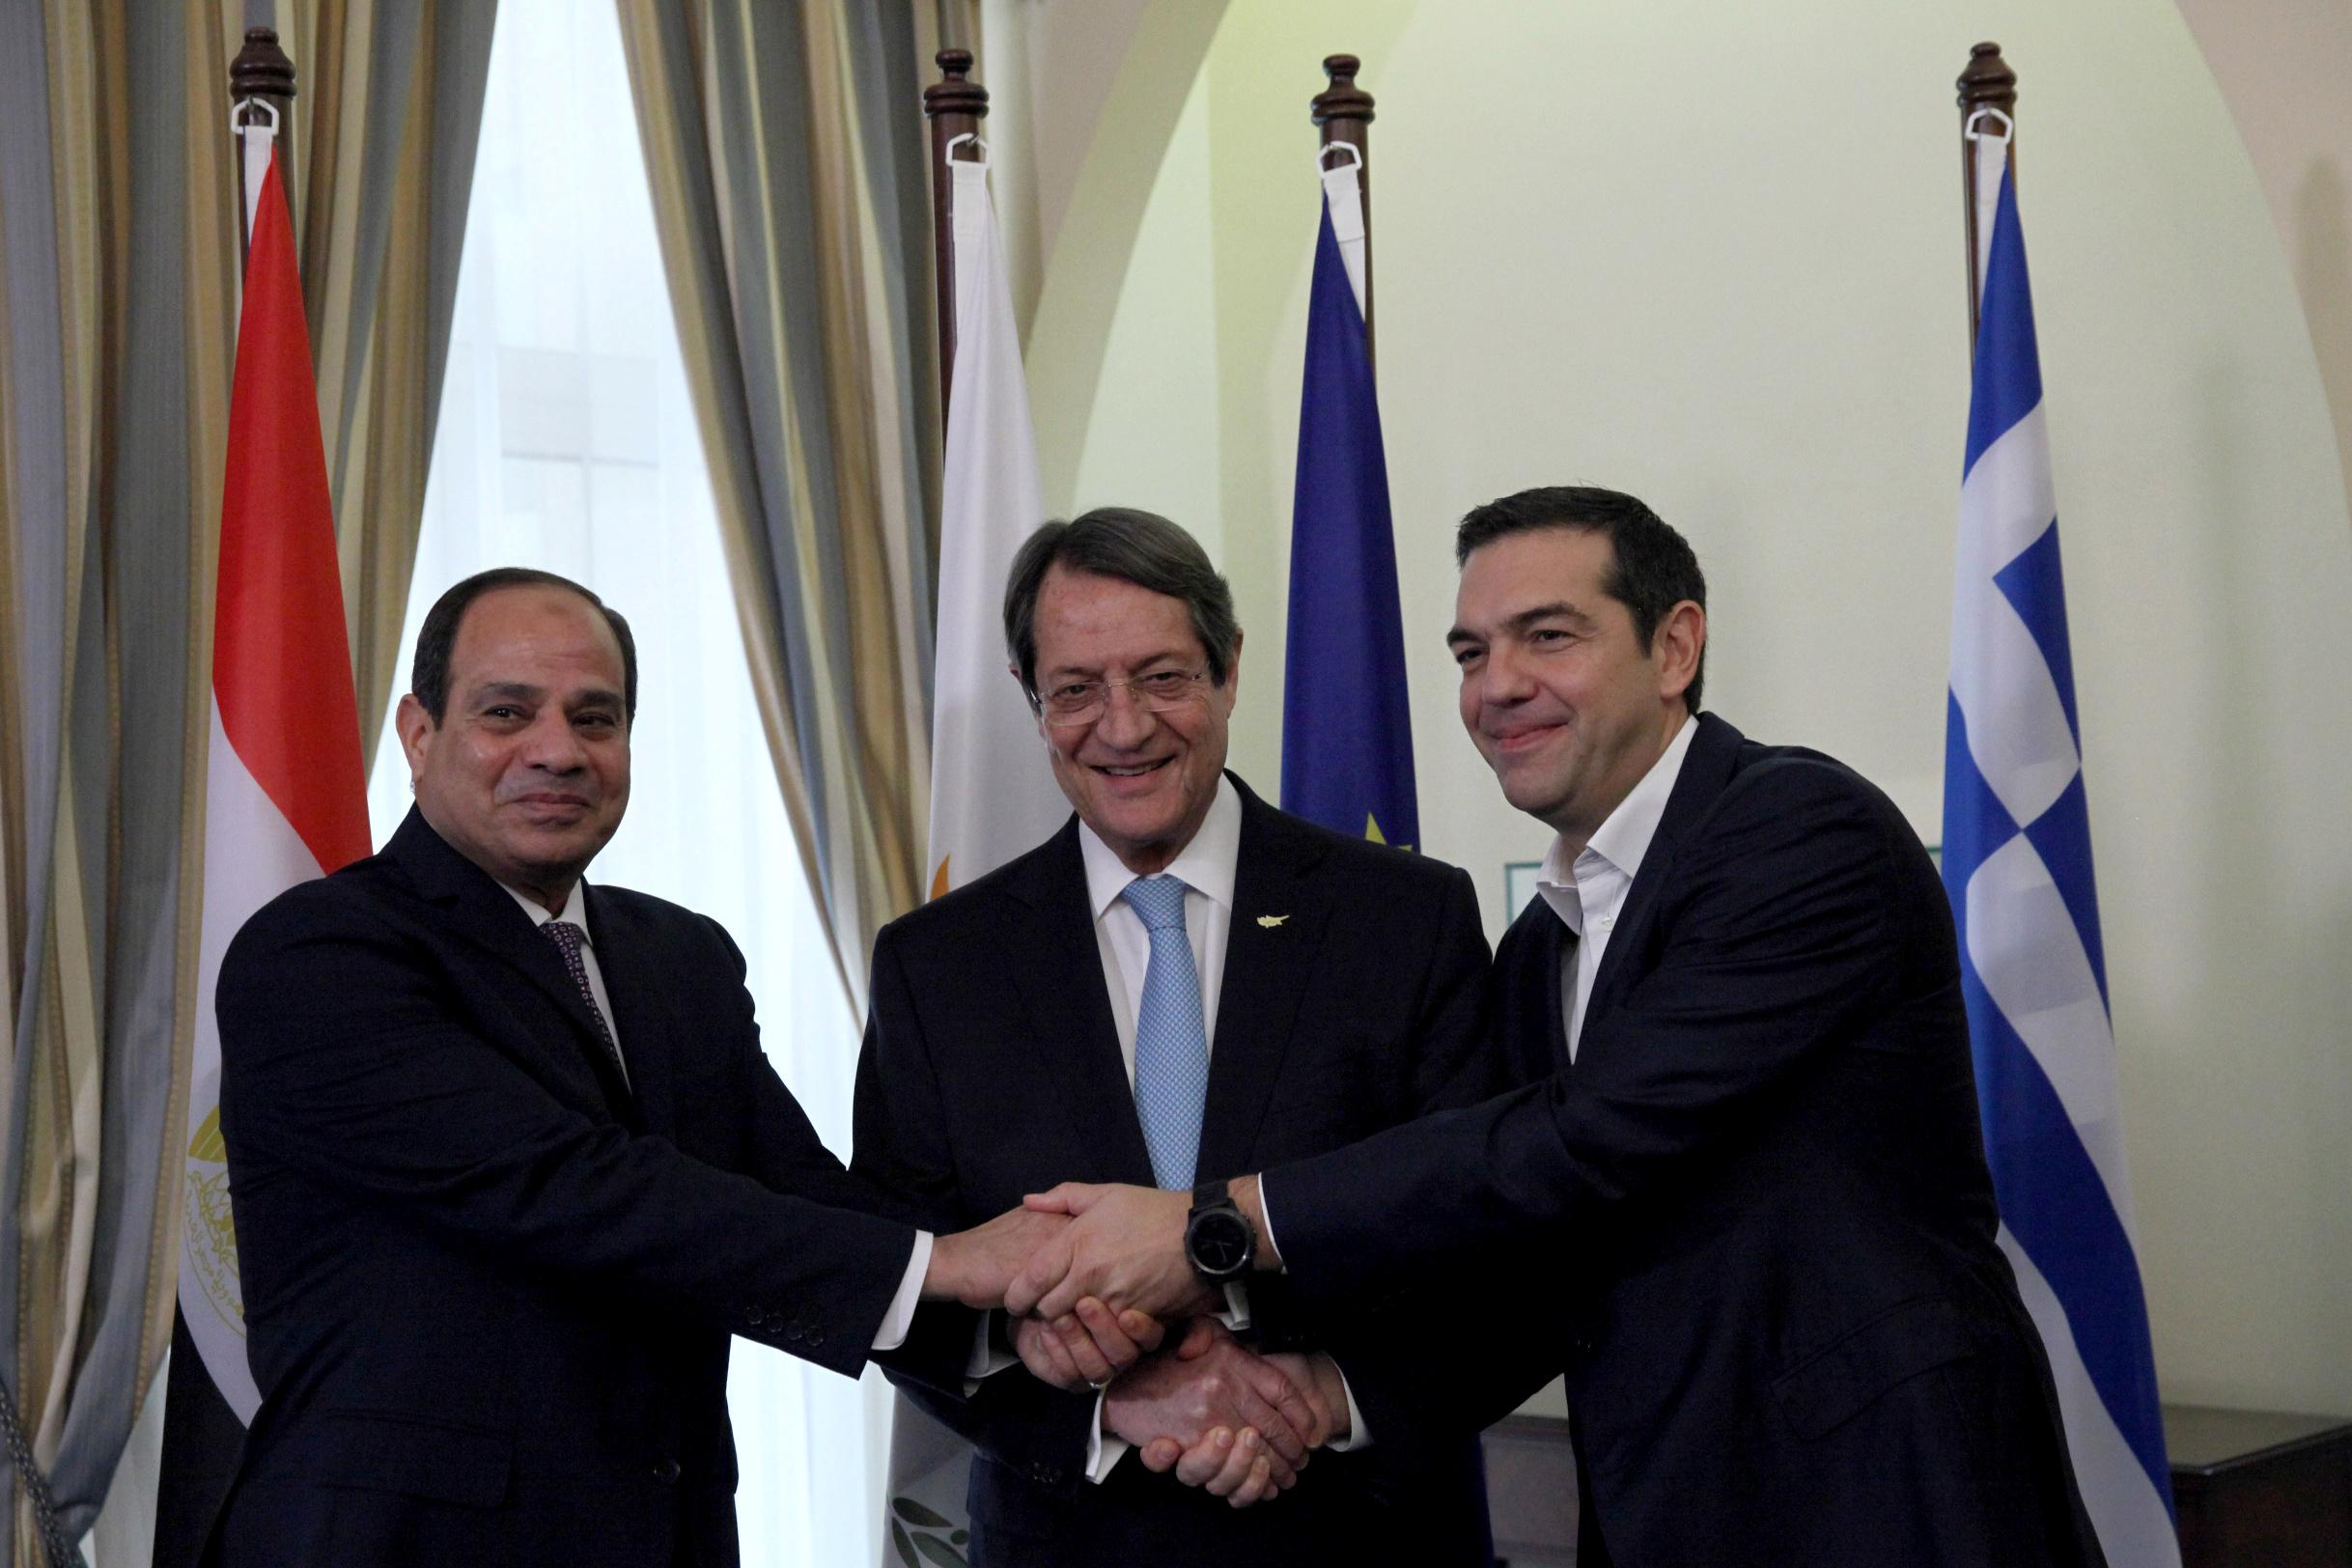 Egipatski presjednik Abdel Fattah al-Sisi, ciparski predsjednik Nicos Anastasiades i grčki premijer Aleksis Tsipras